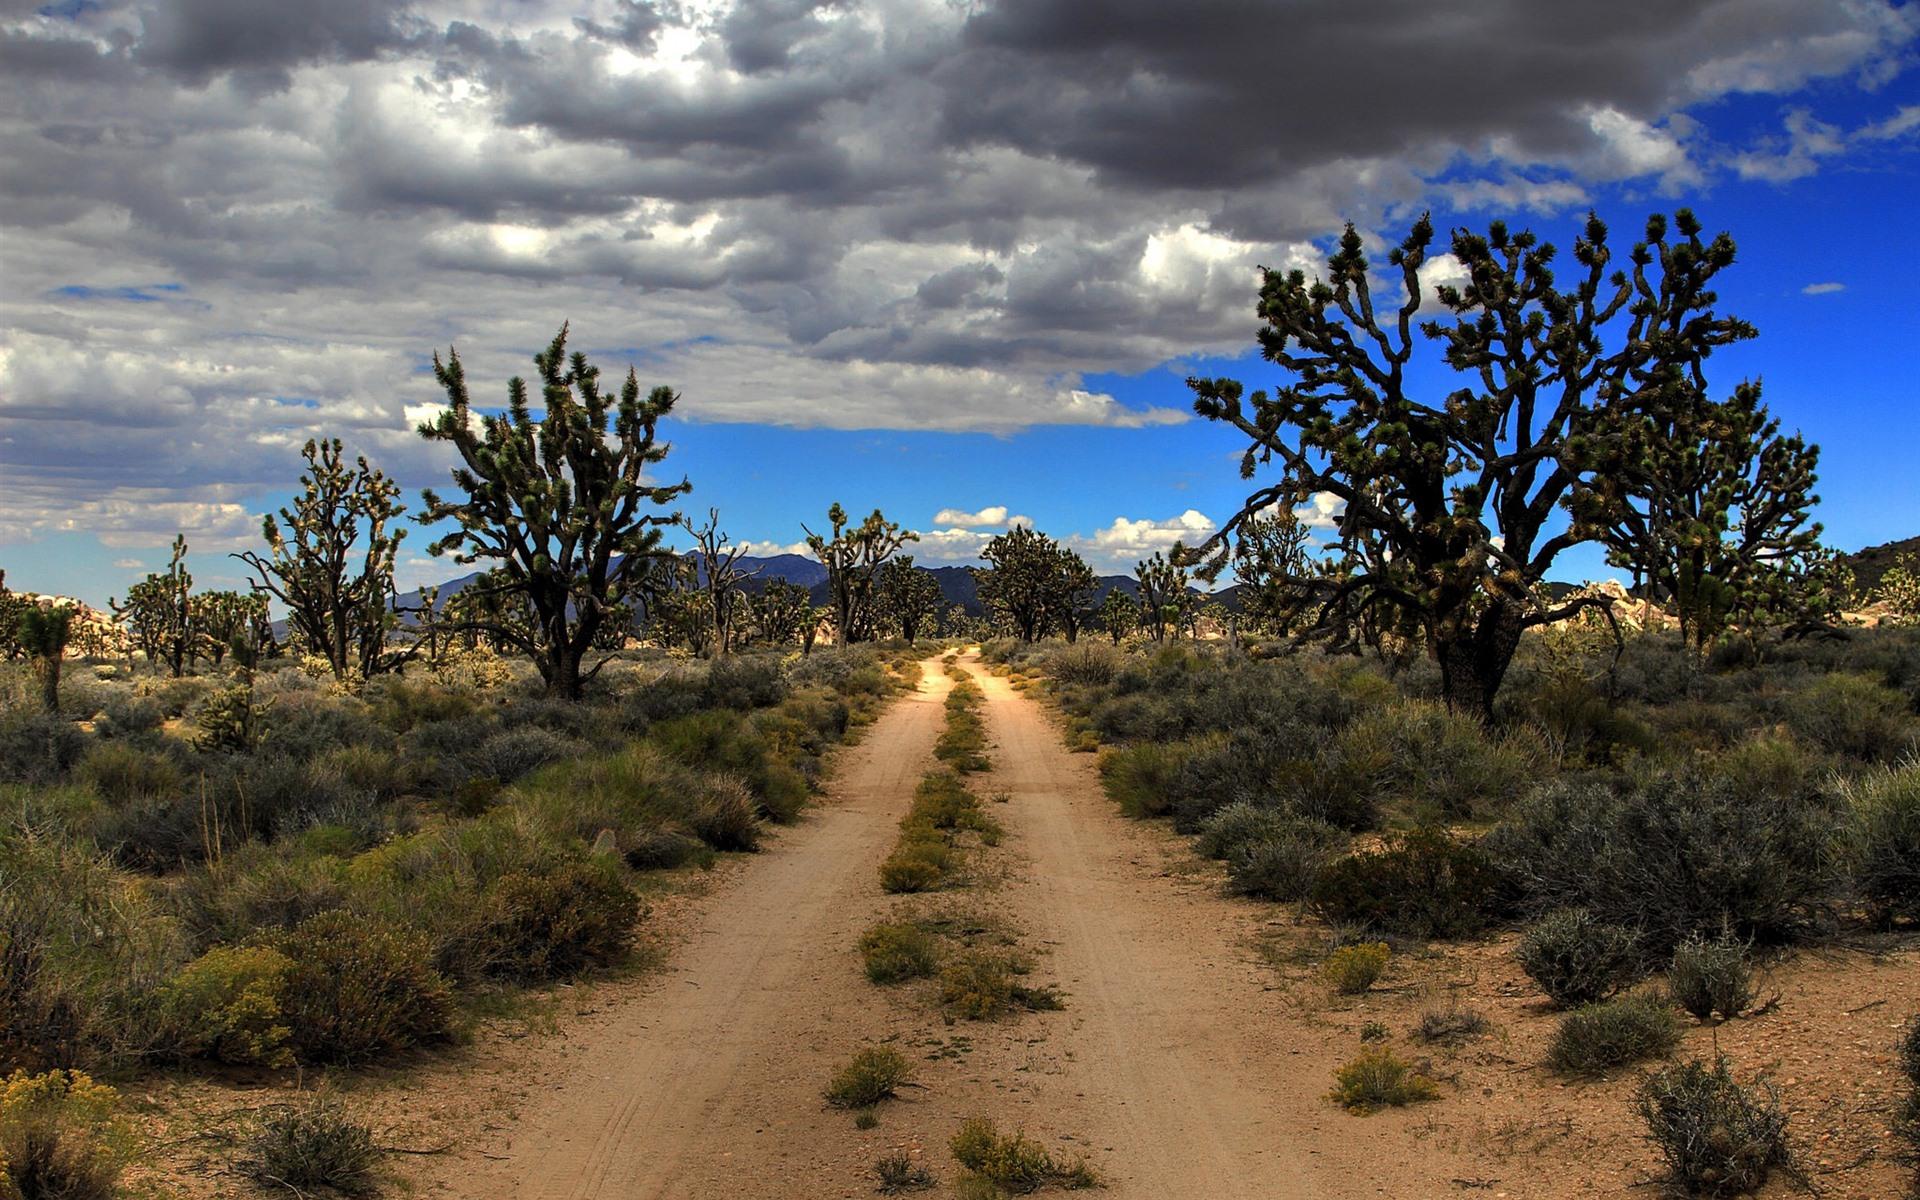 Wallpaper usa mojave joshua tree national park desert 1920x1200 hd picture image - Joshua tree wallpaper ...